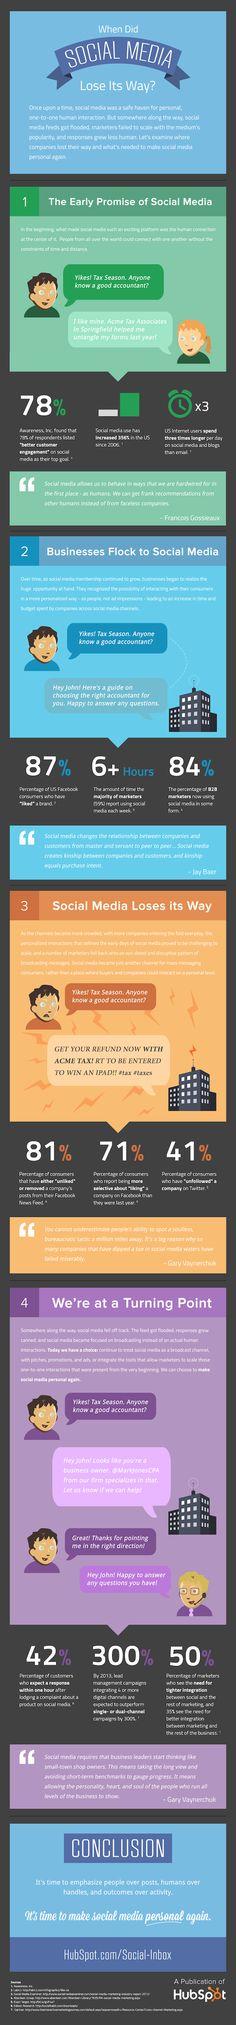 When Did #SocialMedia Lose Its Way? [#Infographic]